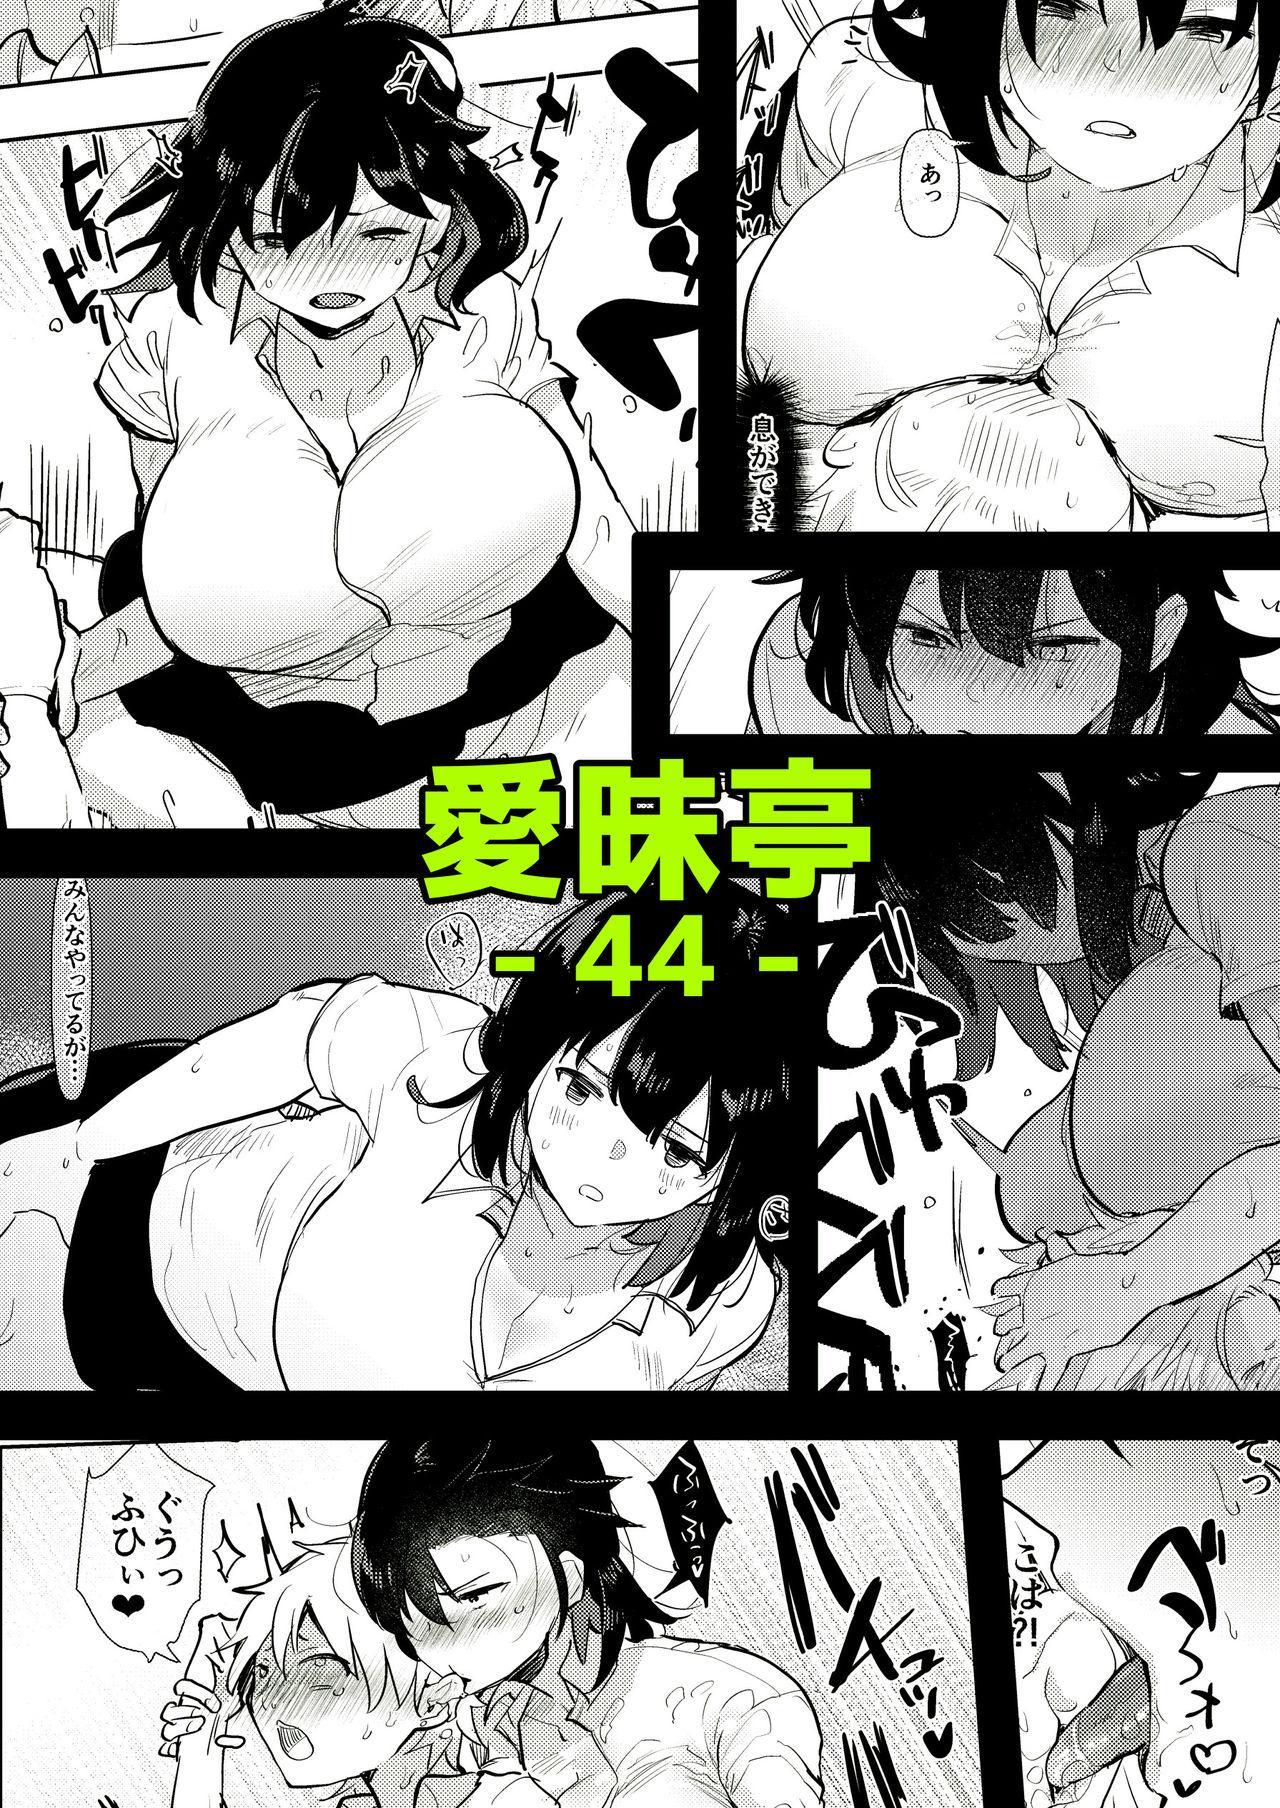 Futanari Osananajimi to Ore to Hajimete no Gyaku Anal Kagai Jugyou 丨扶她青梅竹馬和我第一次的反向小穴做愛課外授課 32